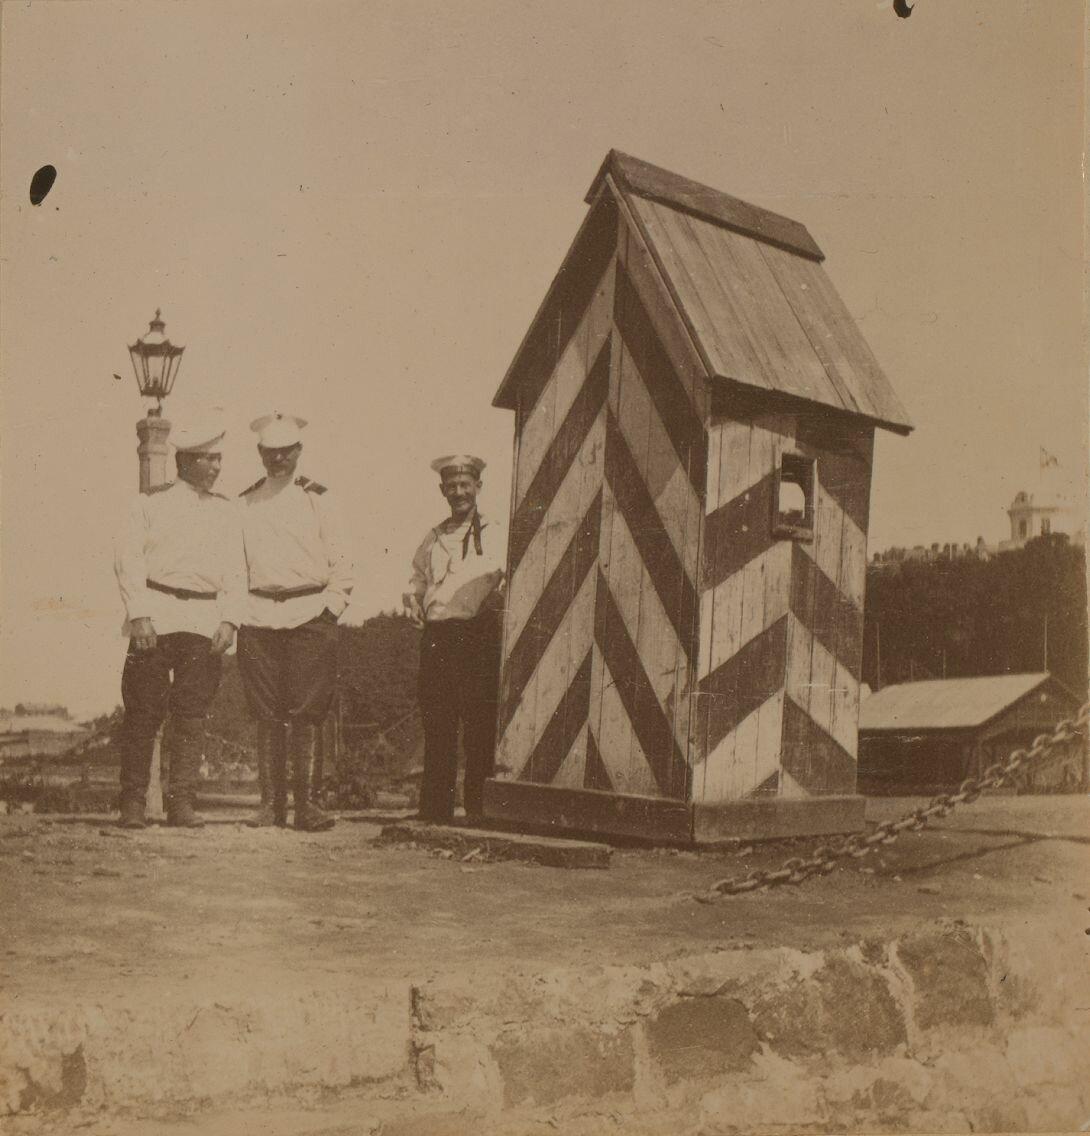 На железной дороге возле будки охранника, Владивосток. 1899